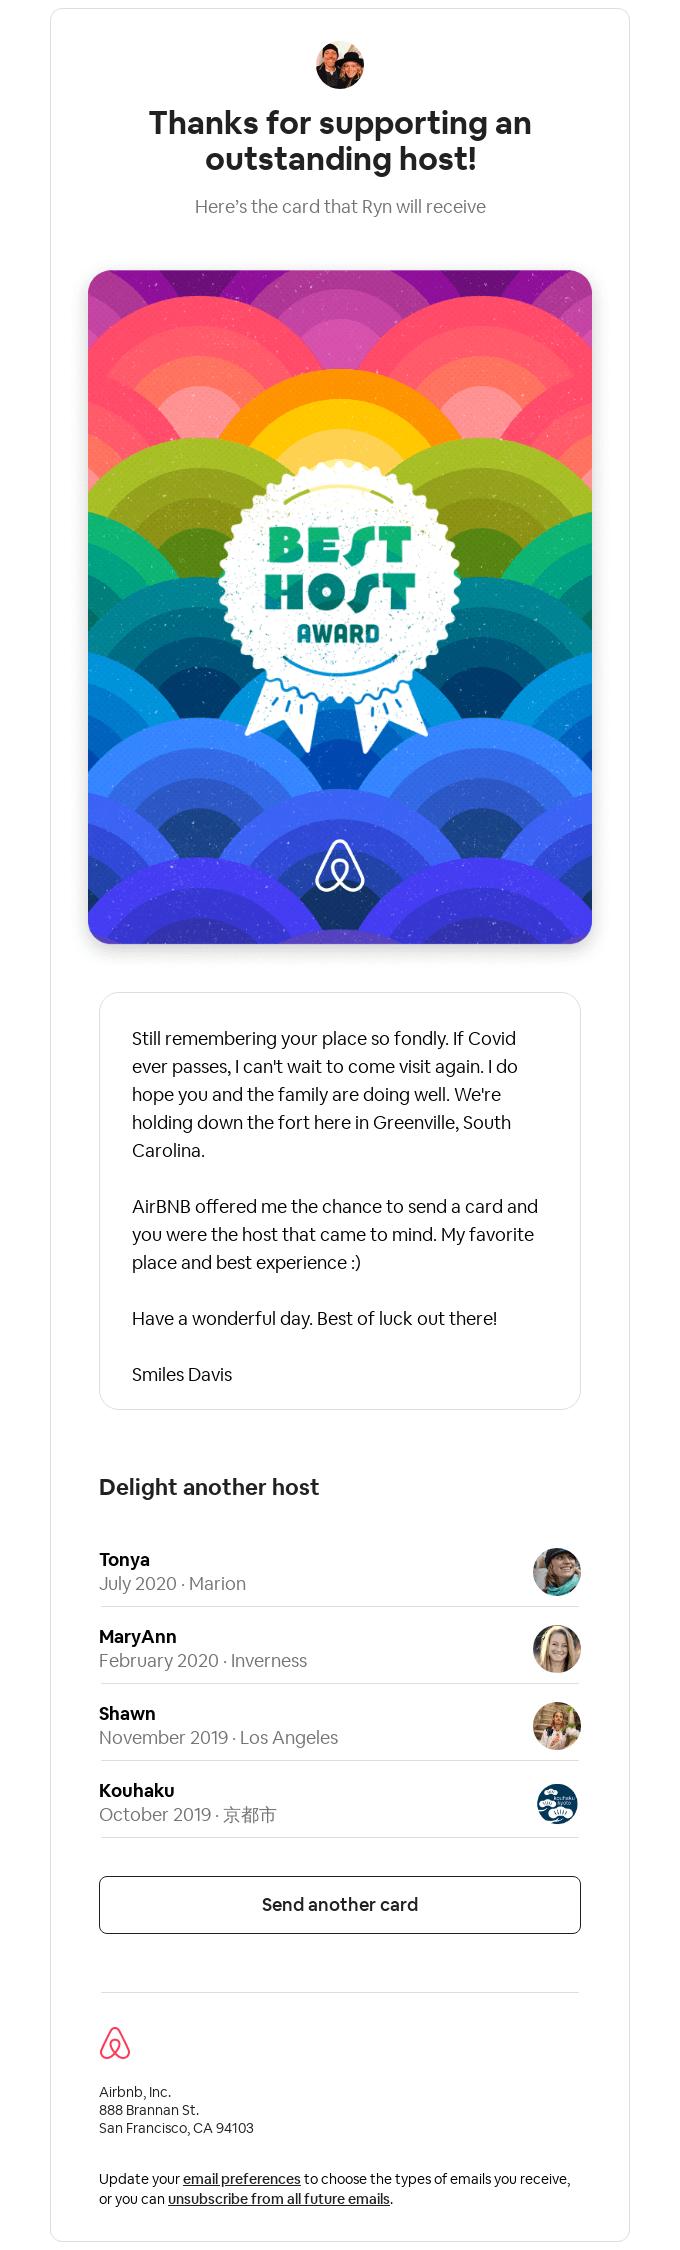 Airbnb - Best Host Award